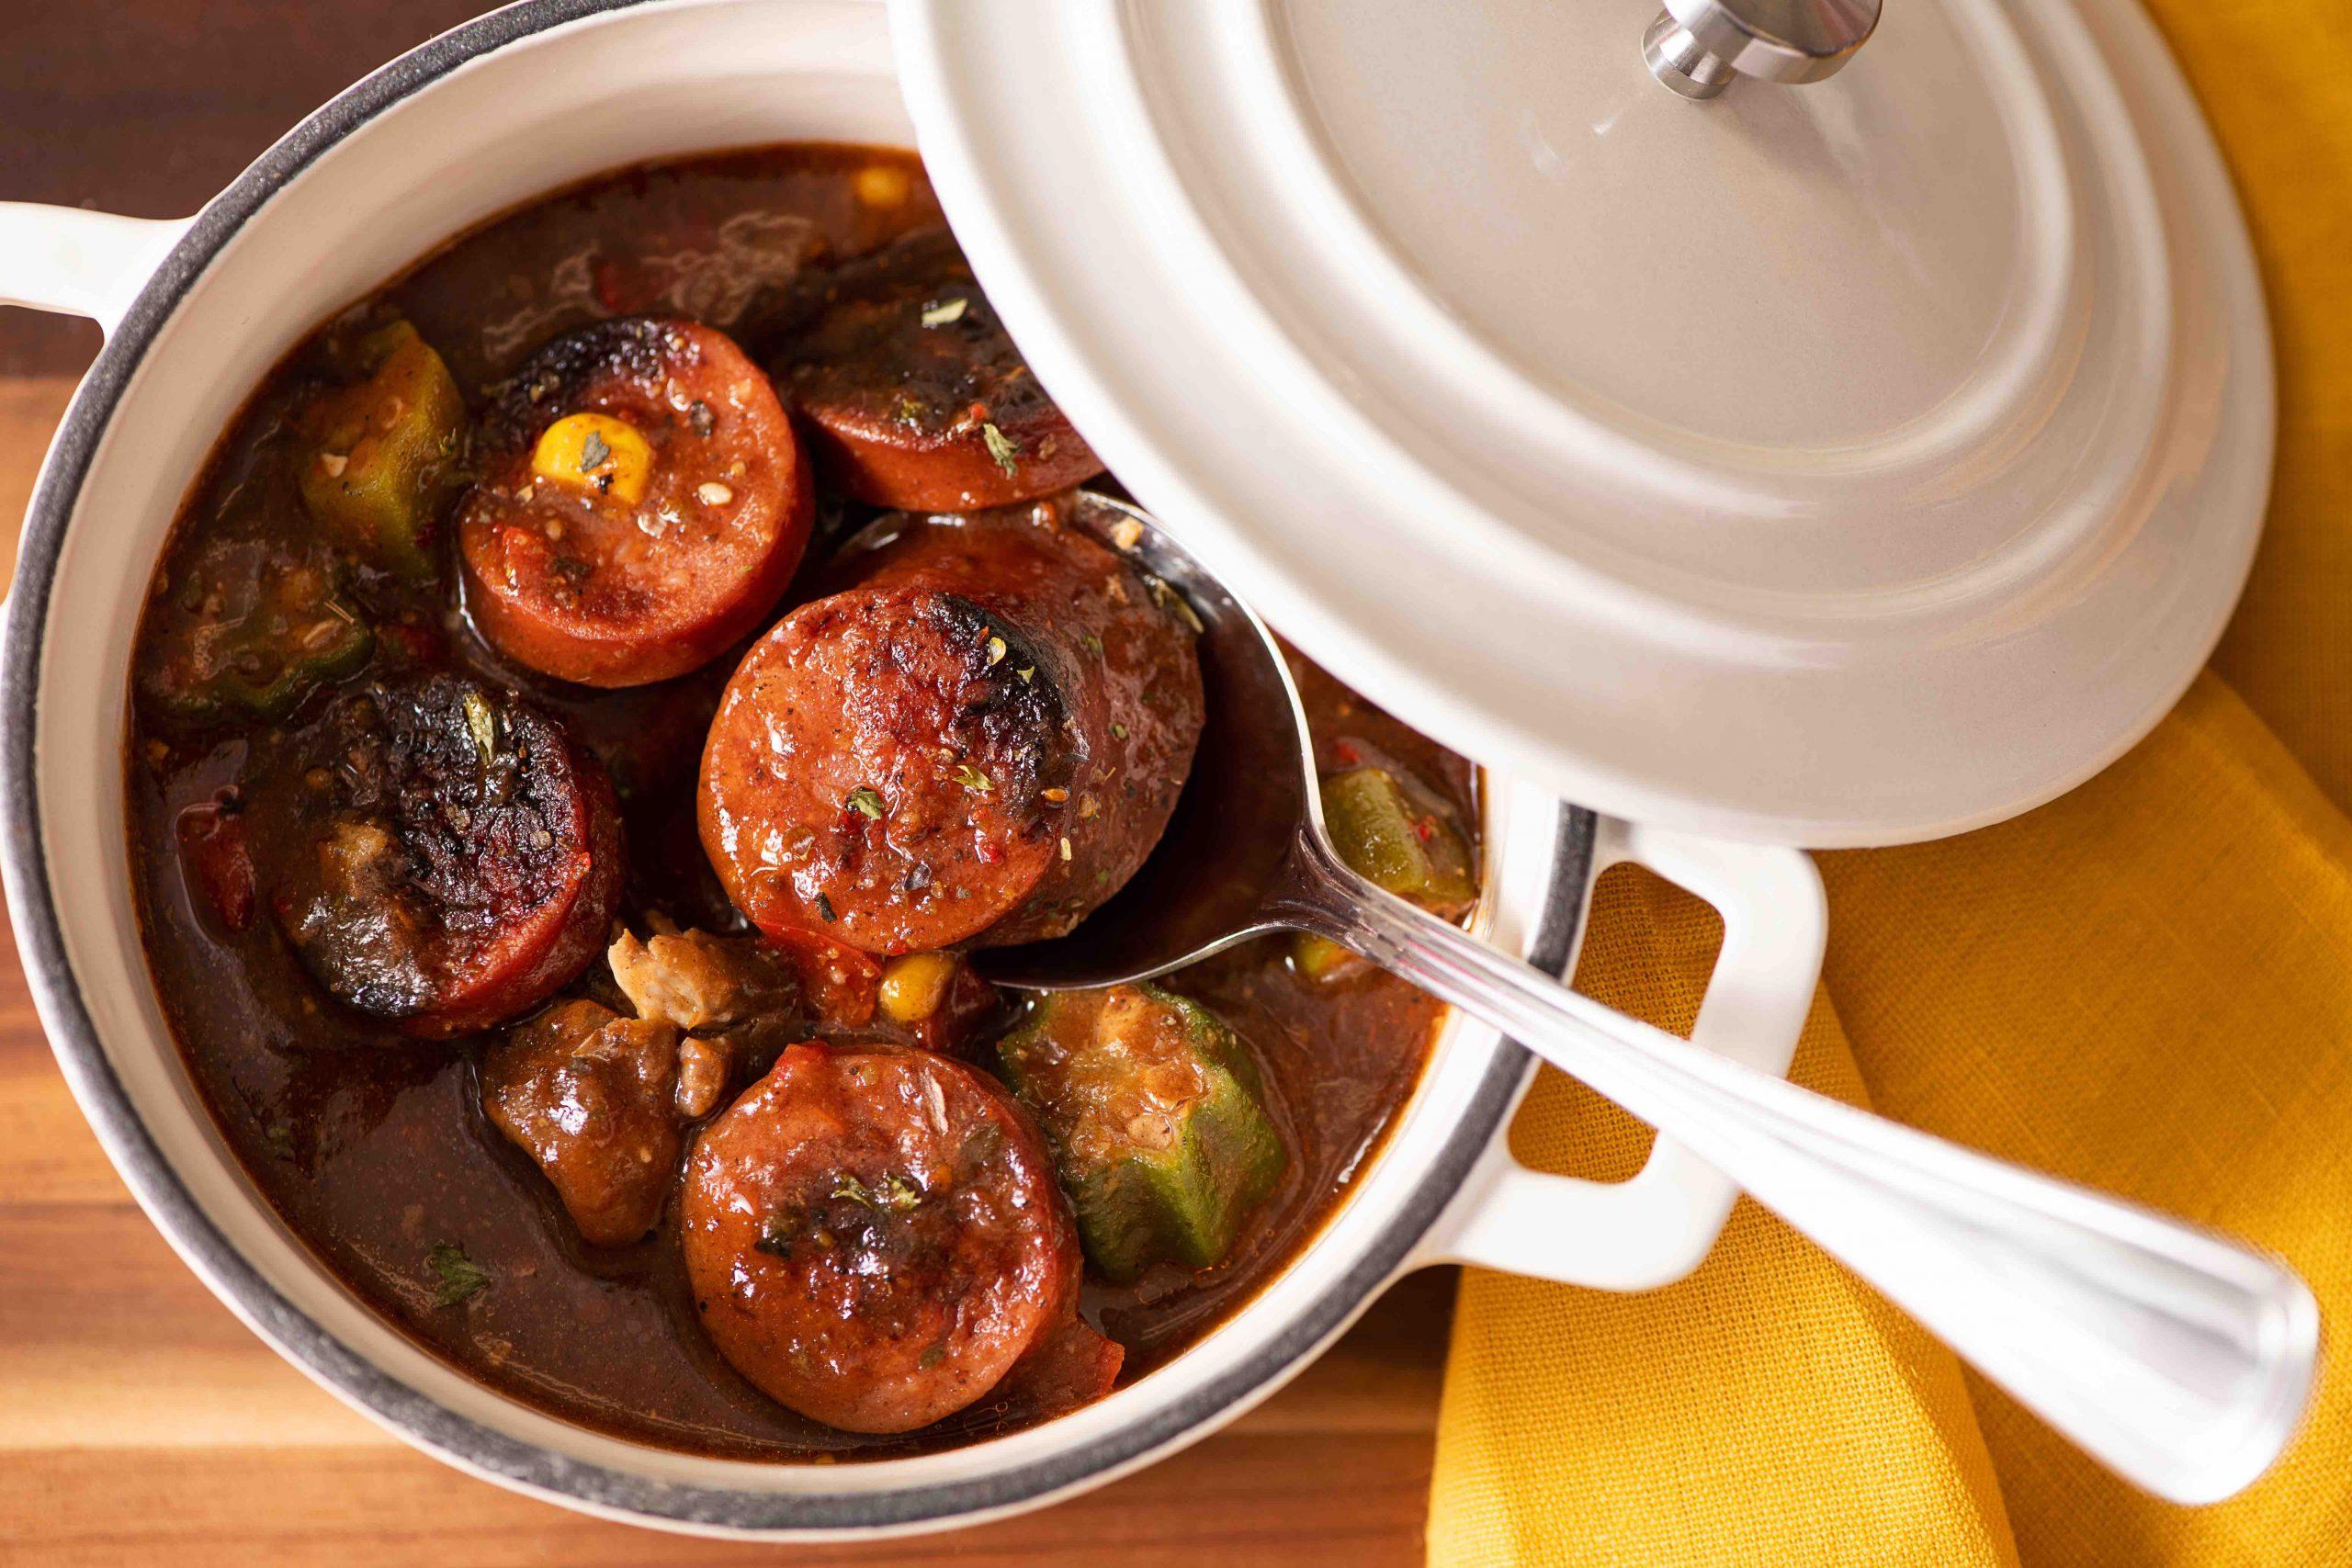 Gumbo stew